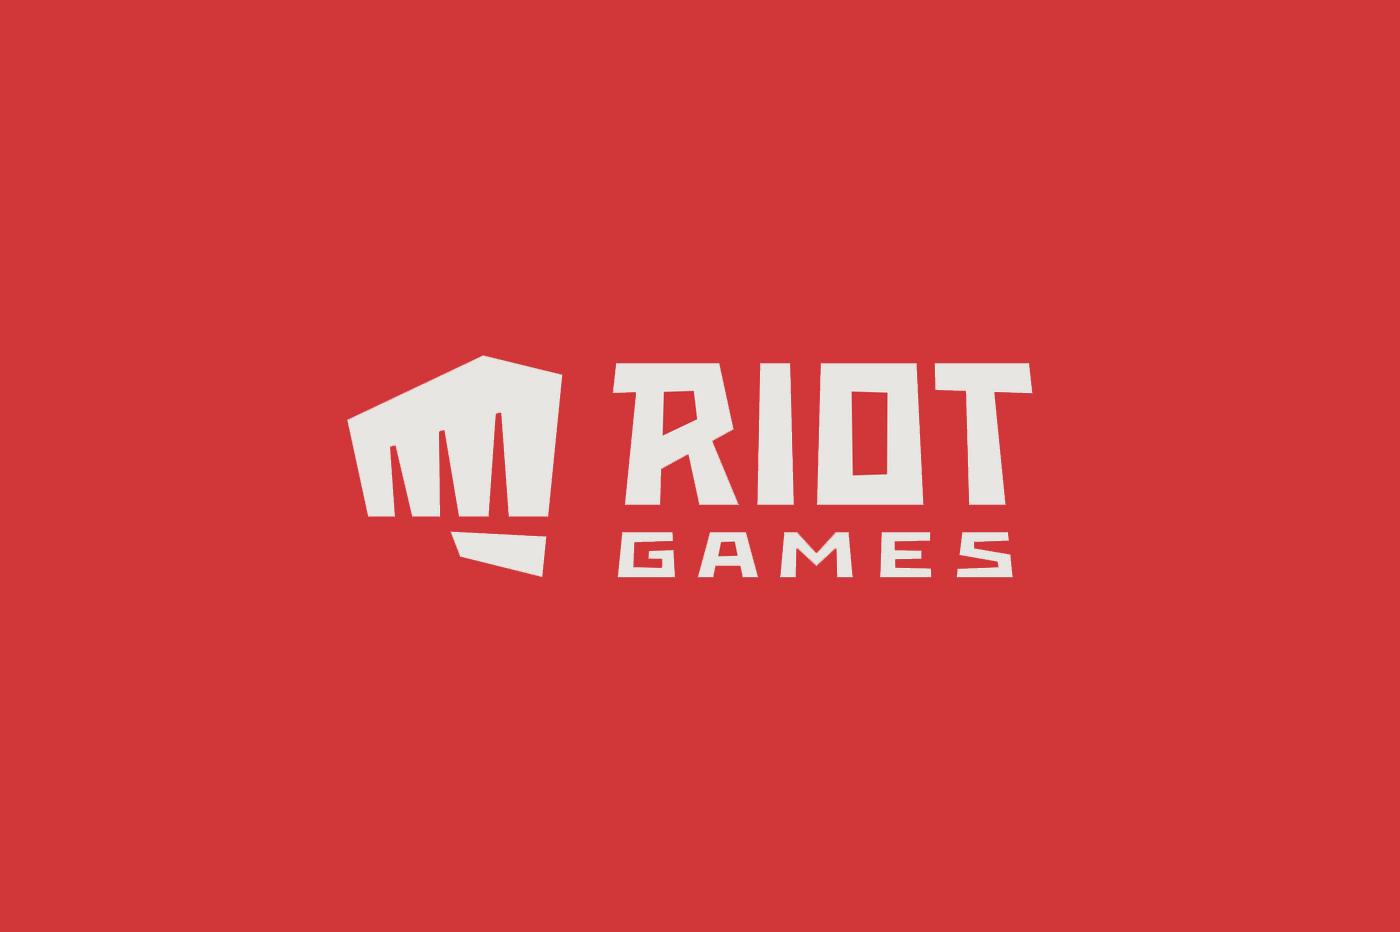 Le logo de Riot Games